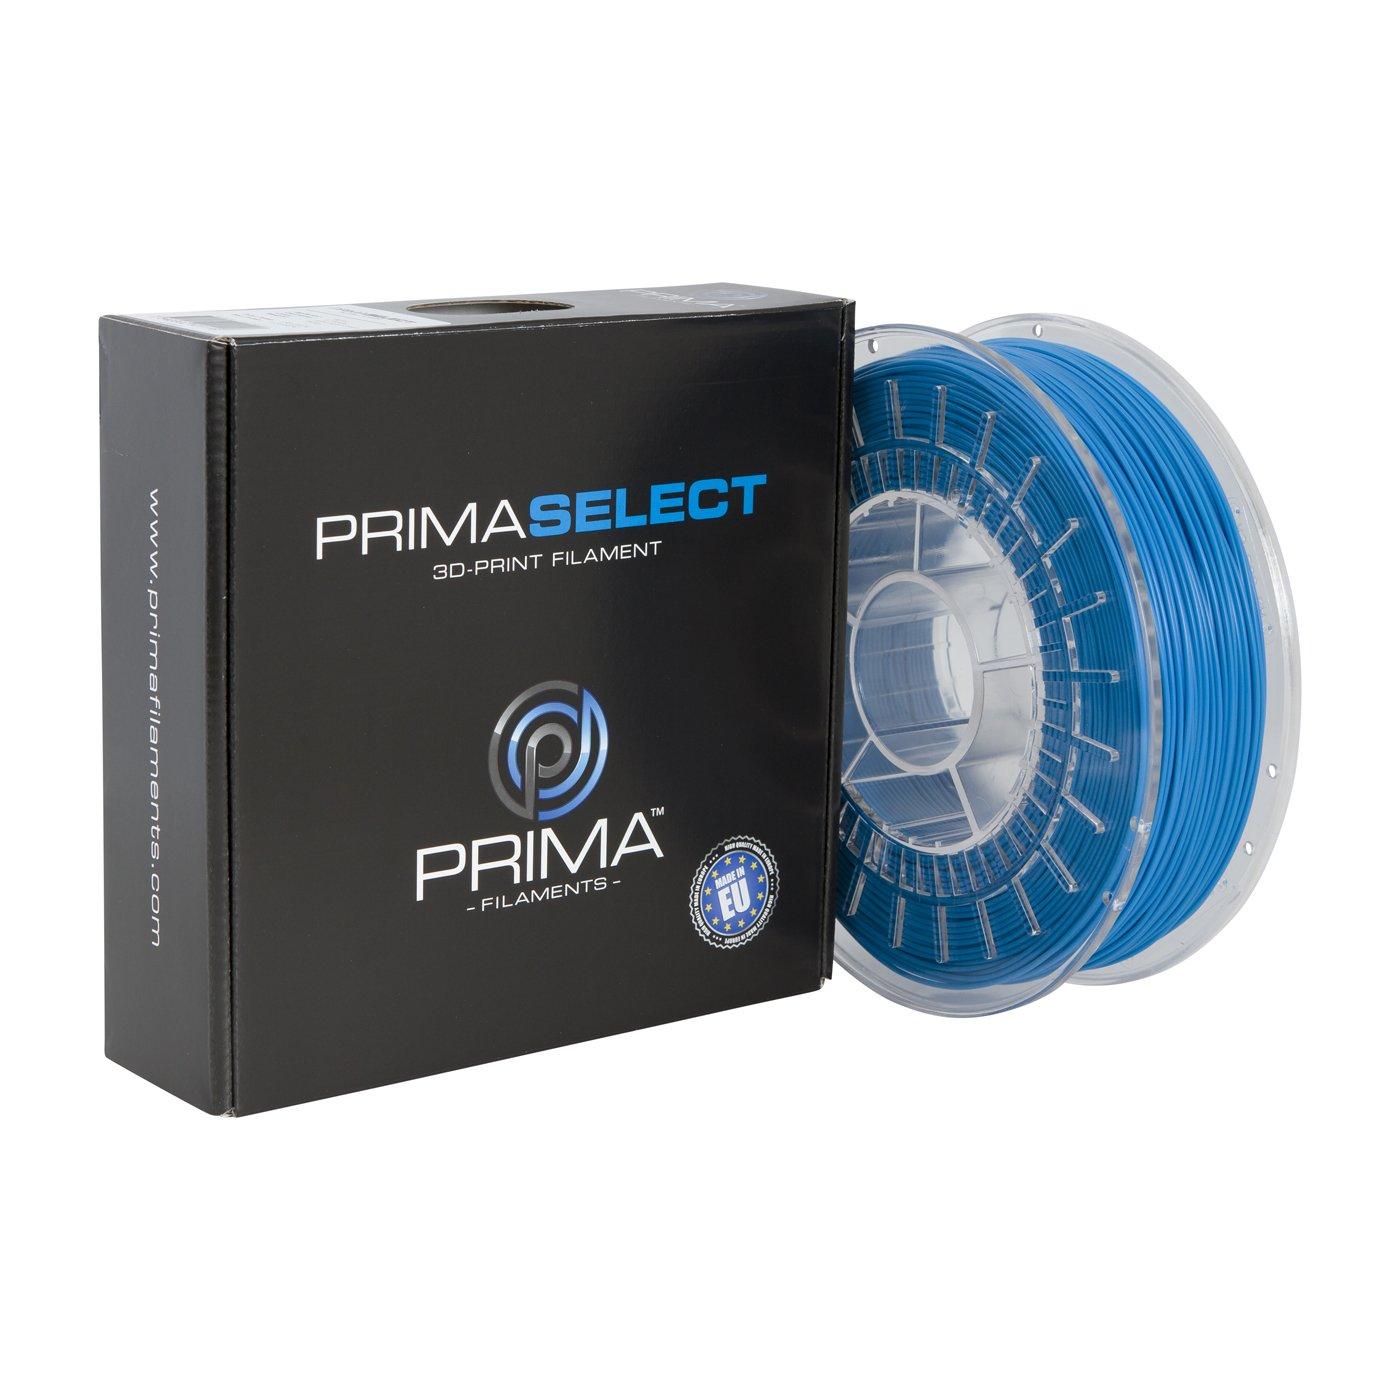 PrimaCreator PrimaSelect 3D Drucker Filament - PLA  - 1,75 mm - 750 g  - Silber B01KRPHCF8 Filament-3D-Druckmaterialien